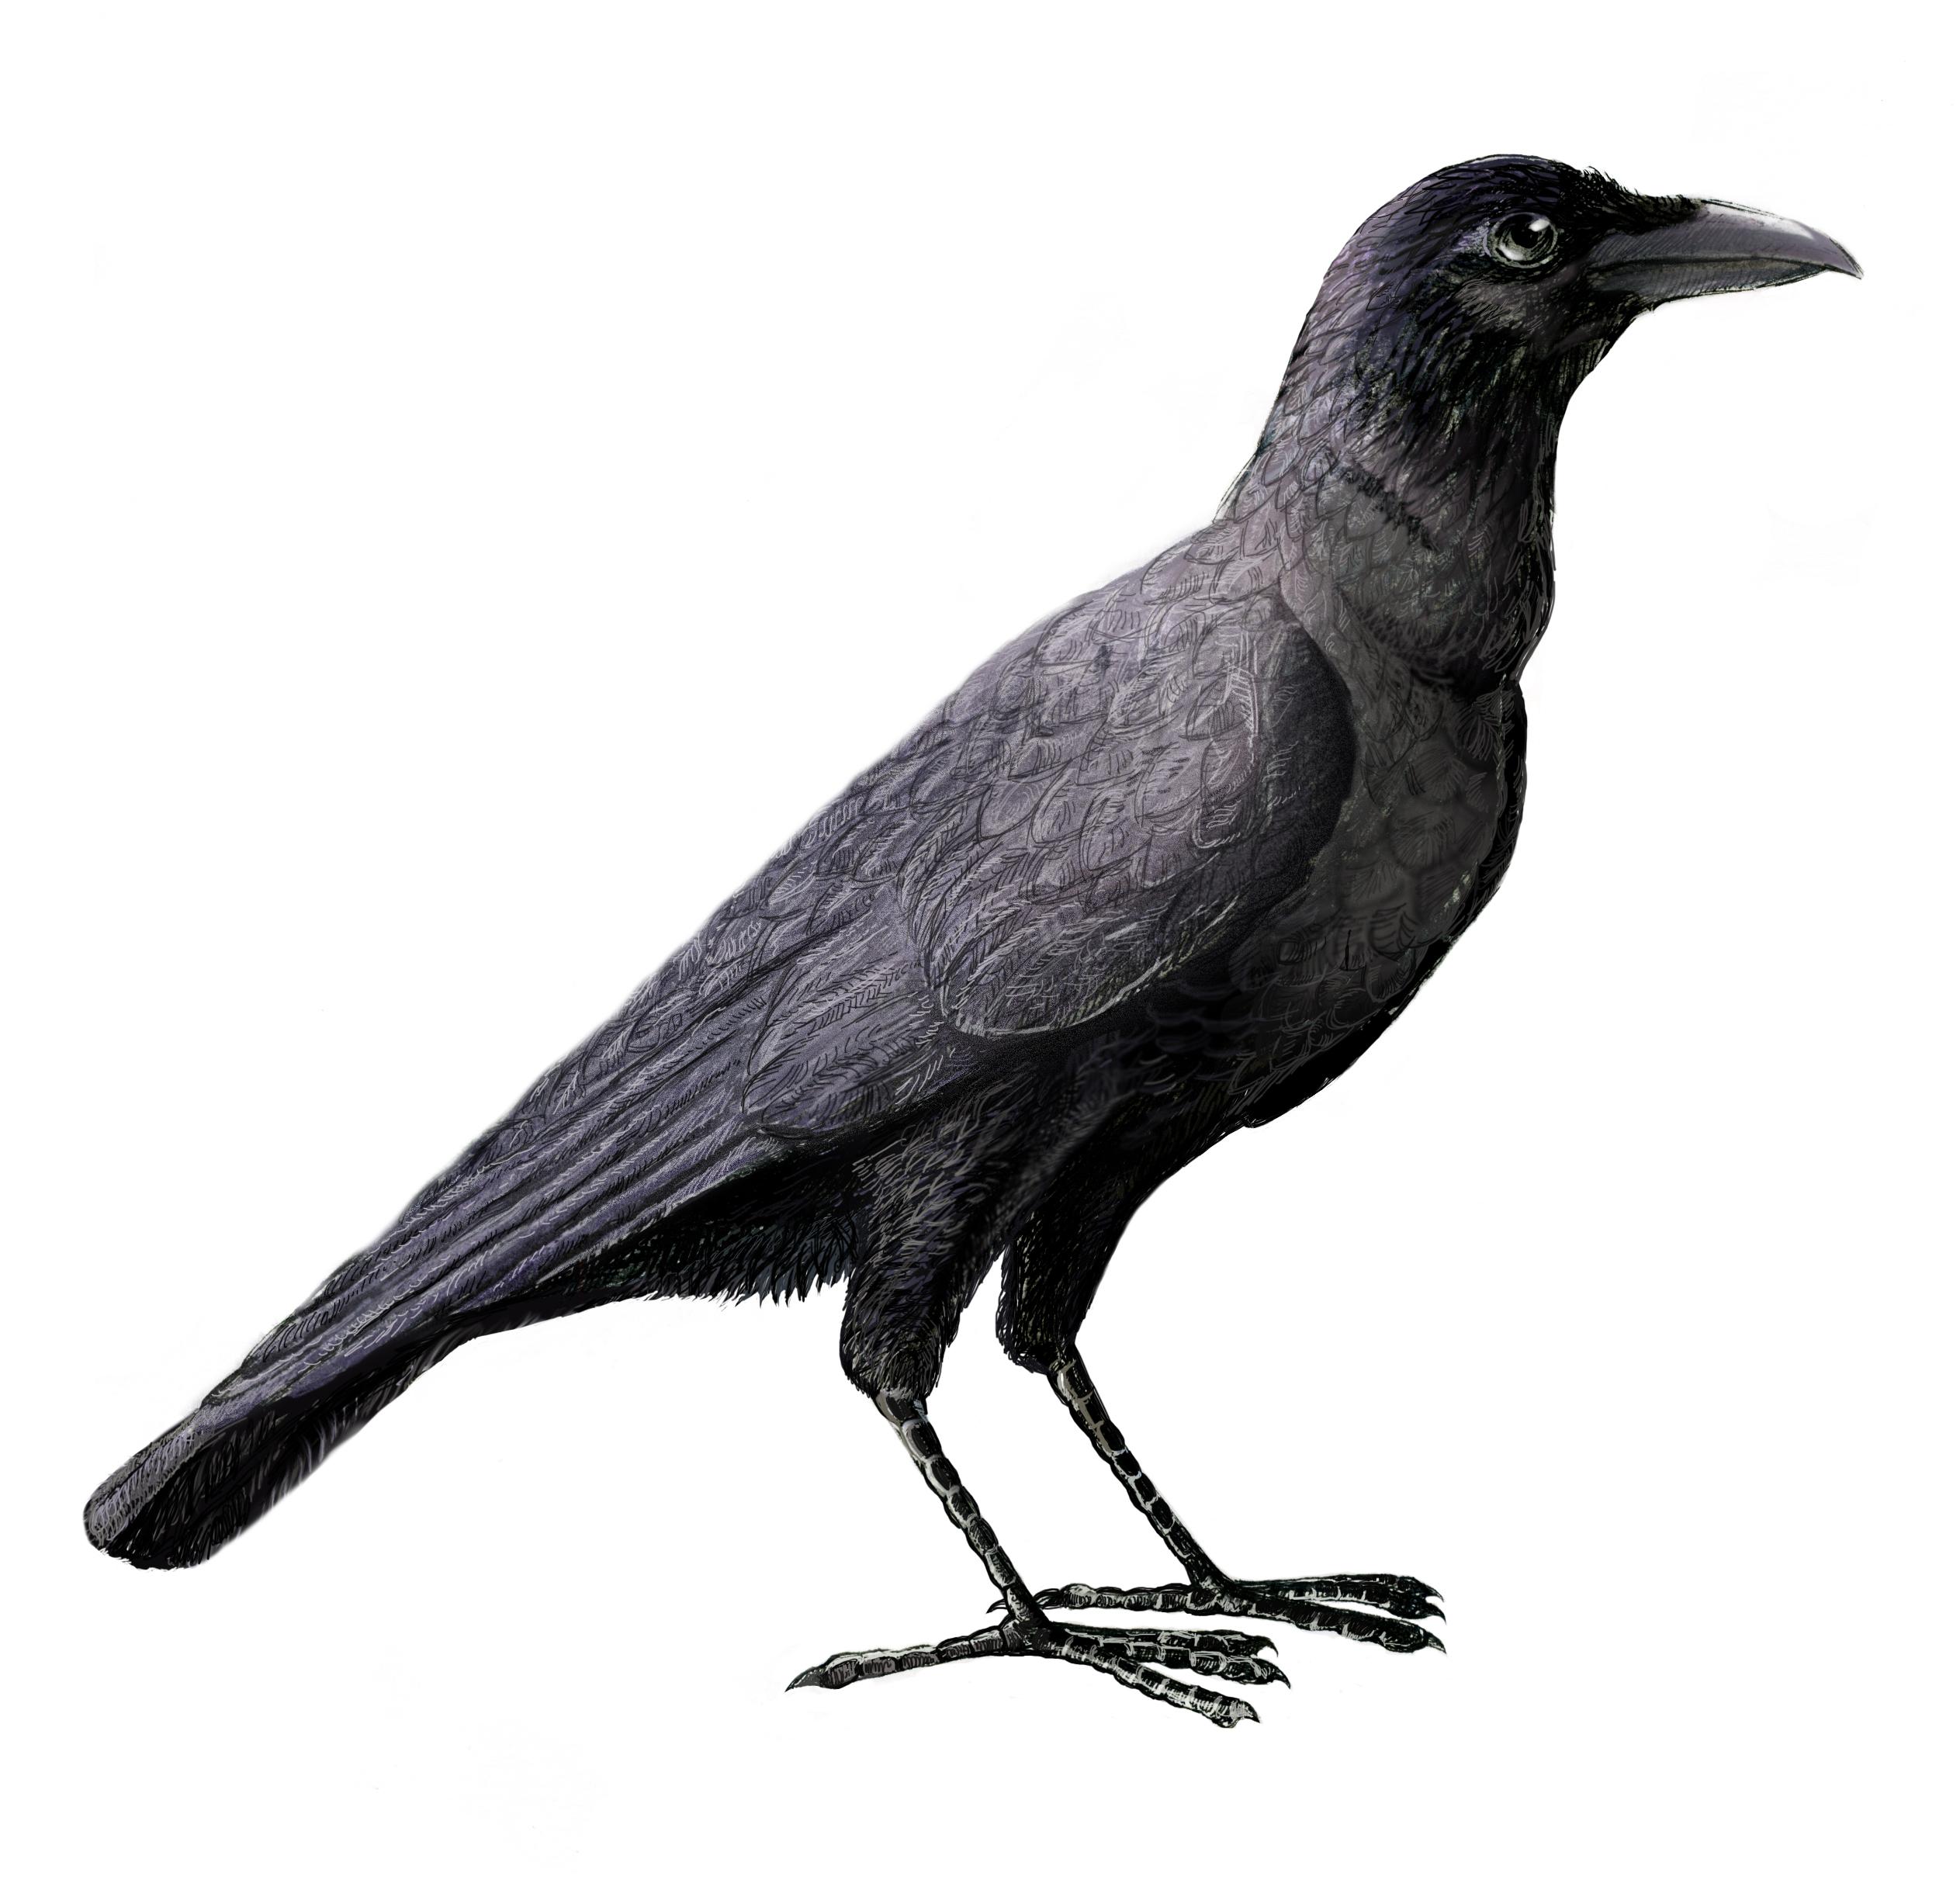 File:Corvus enca.jpg - Wikimedia Commons